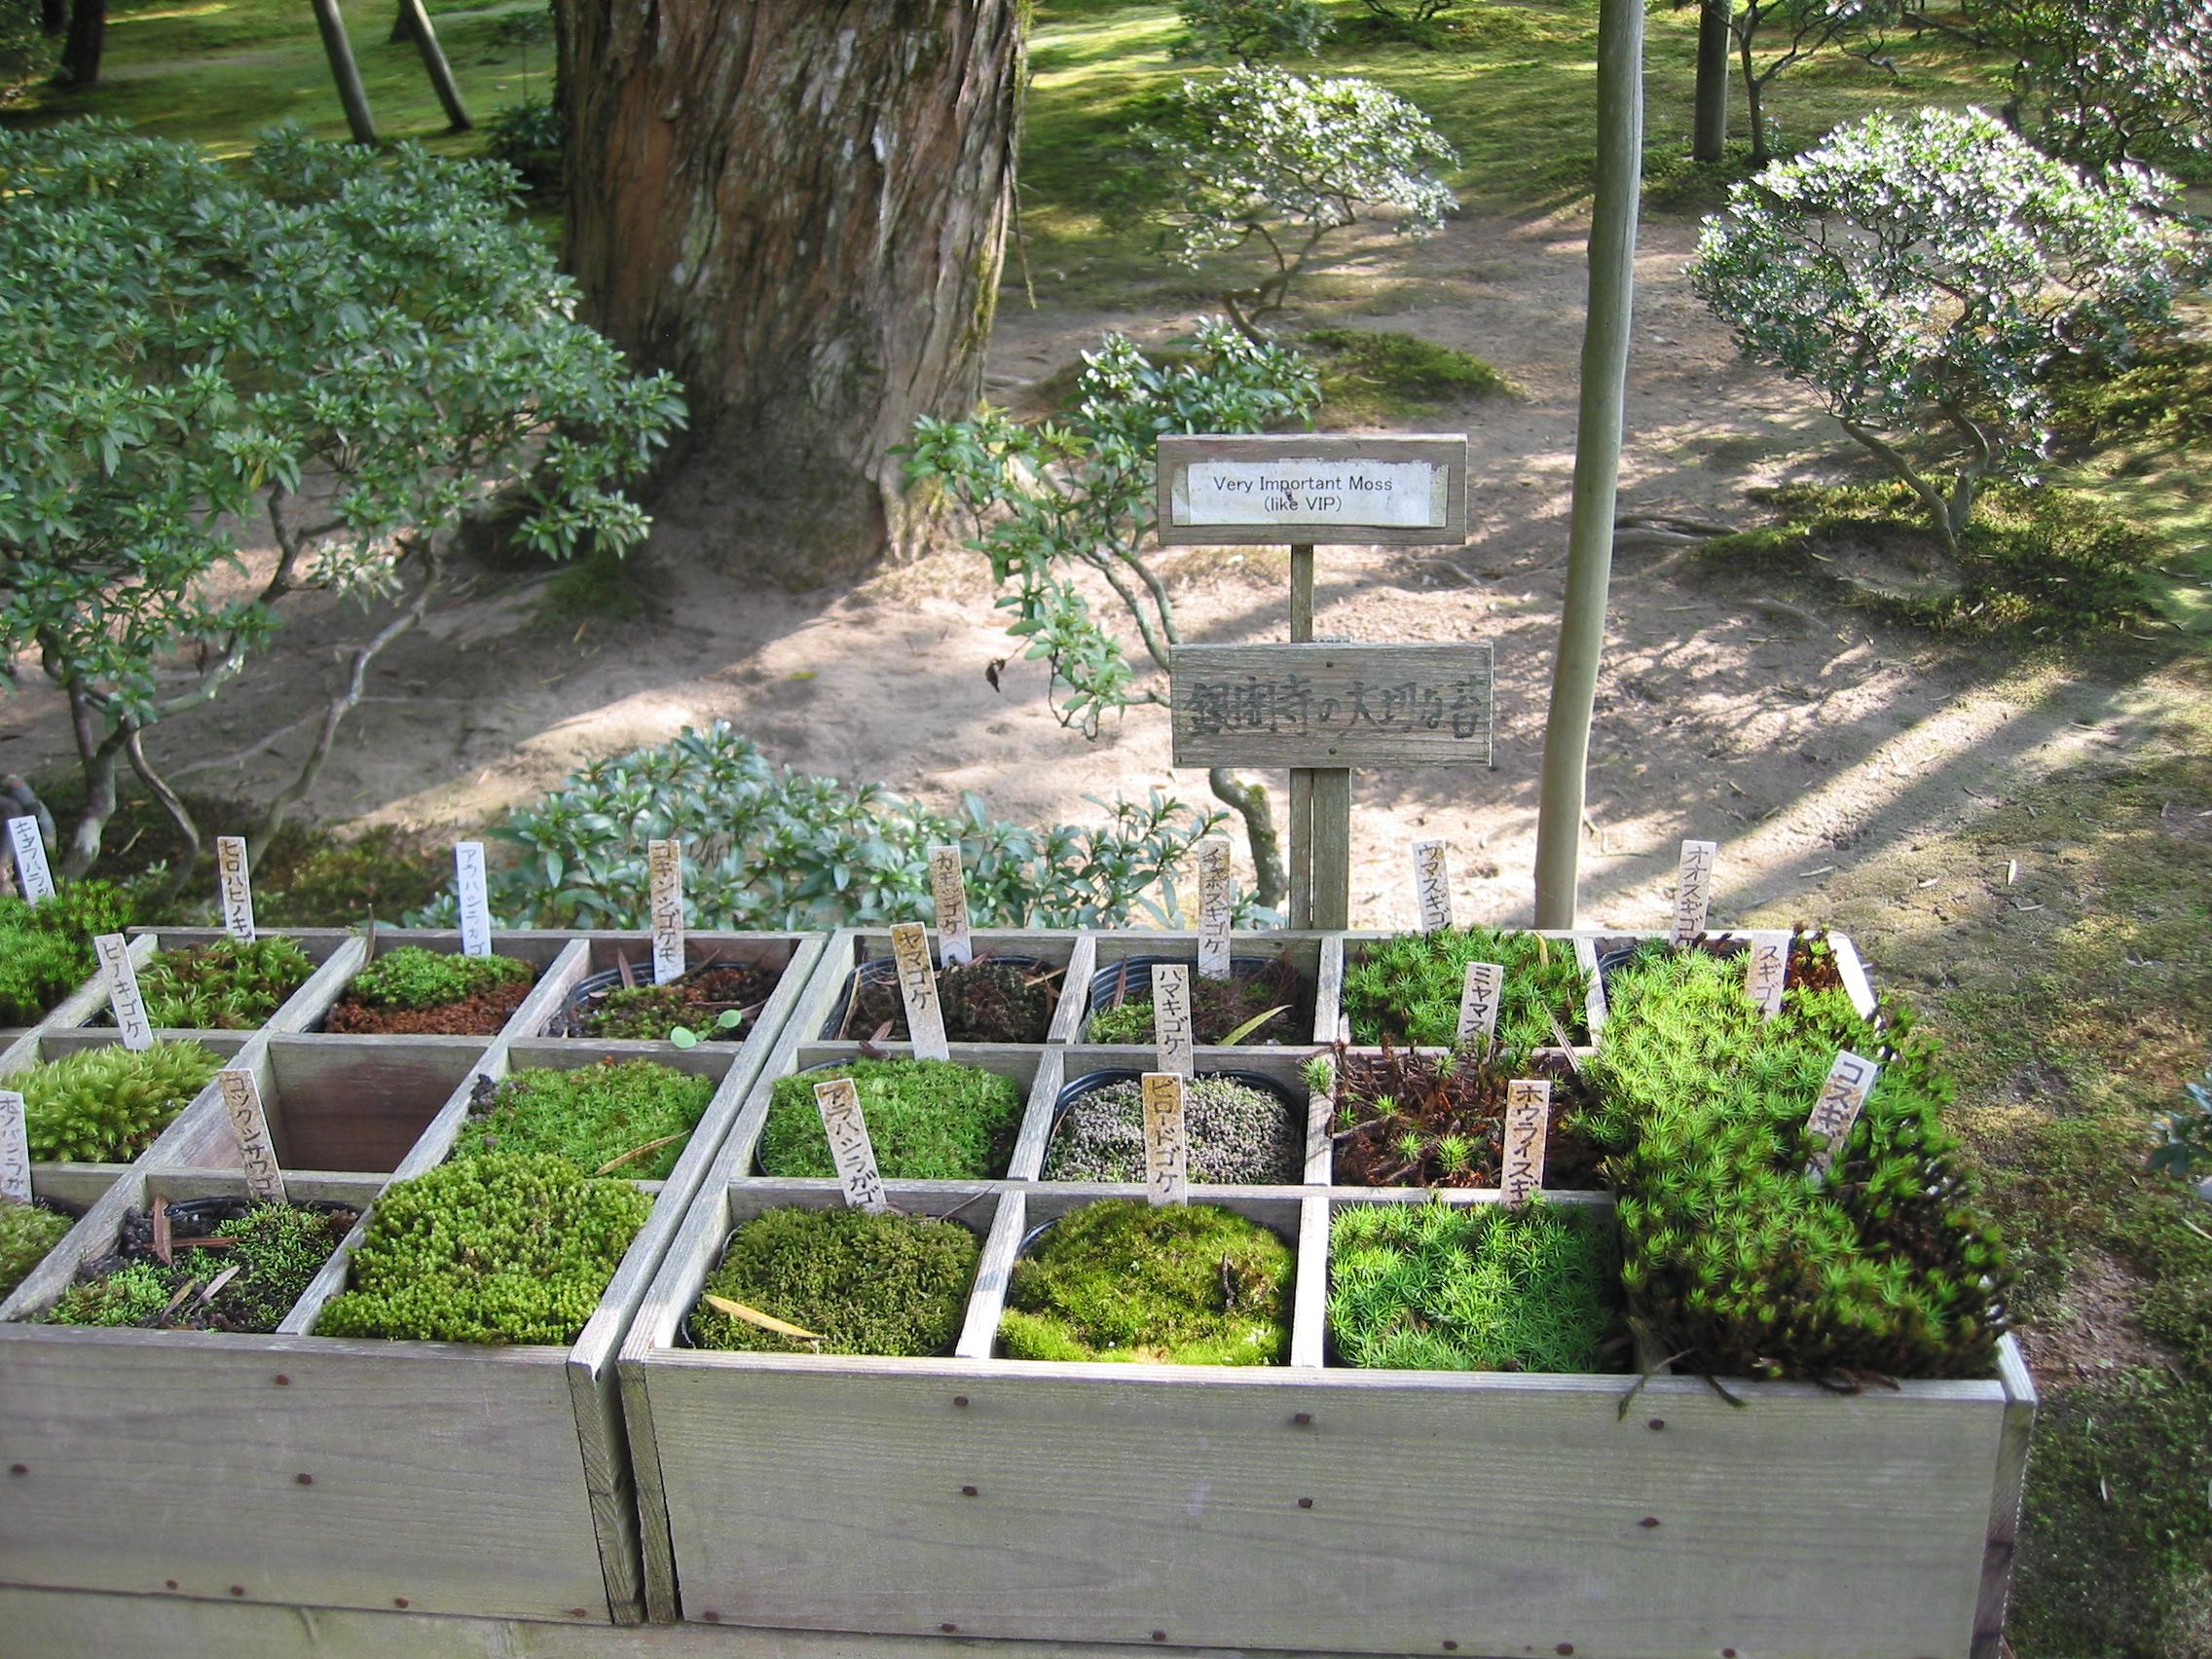 Kyoto japanese garden day, purpose